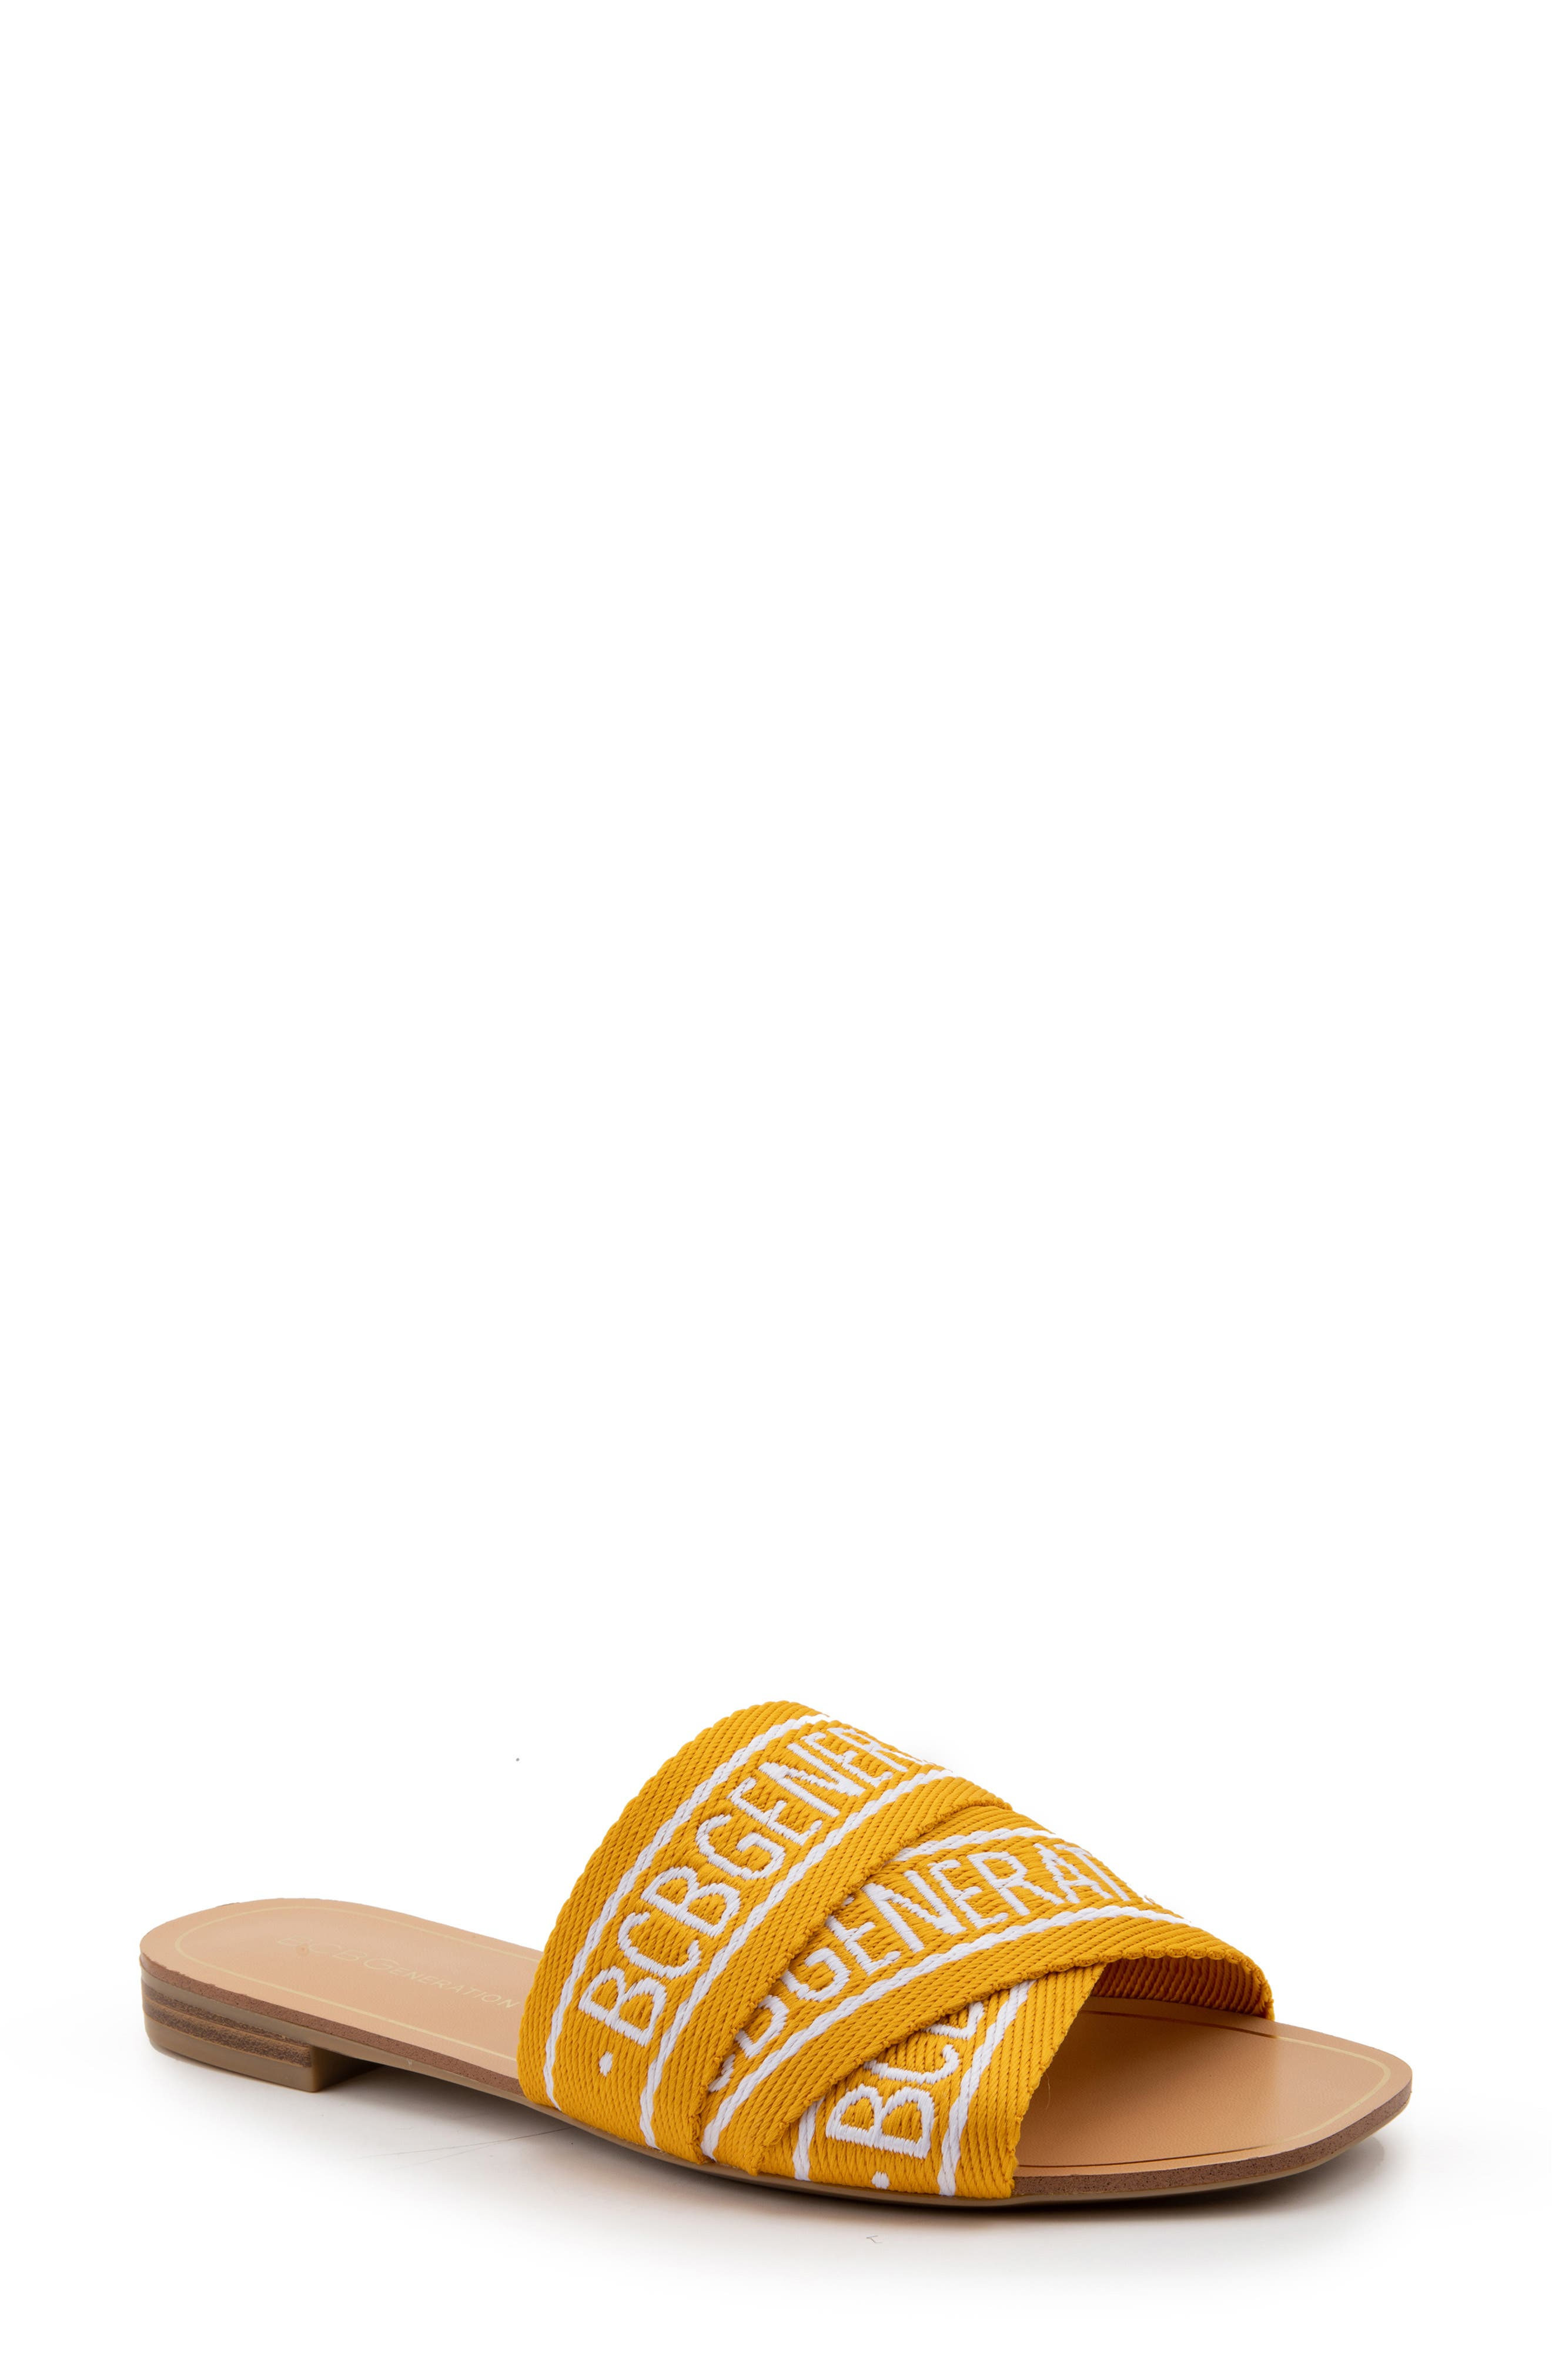 Kala Slide Sandal